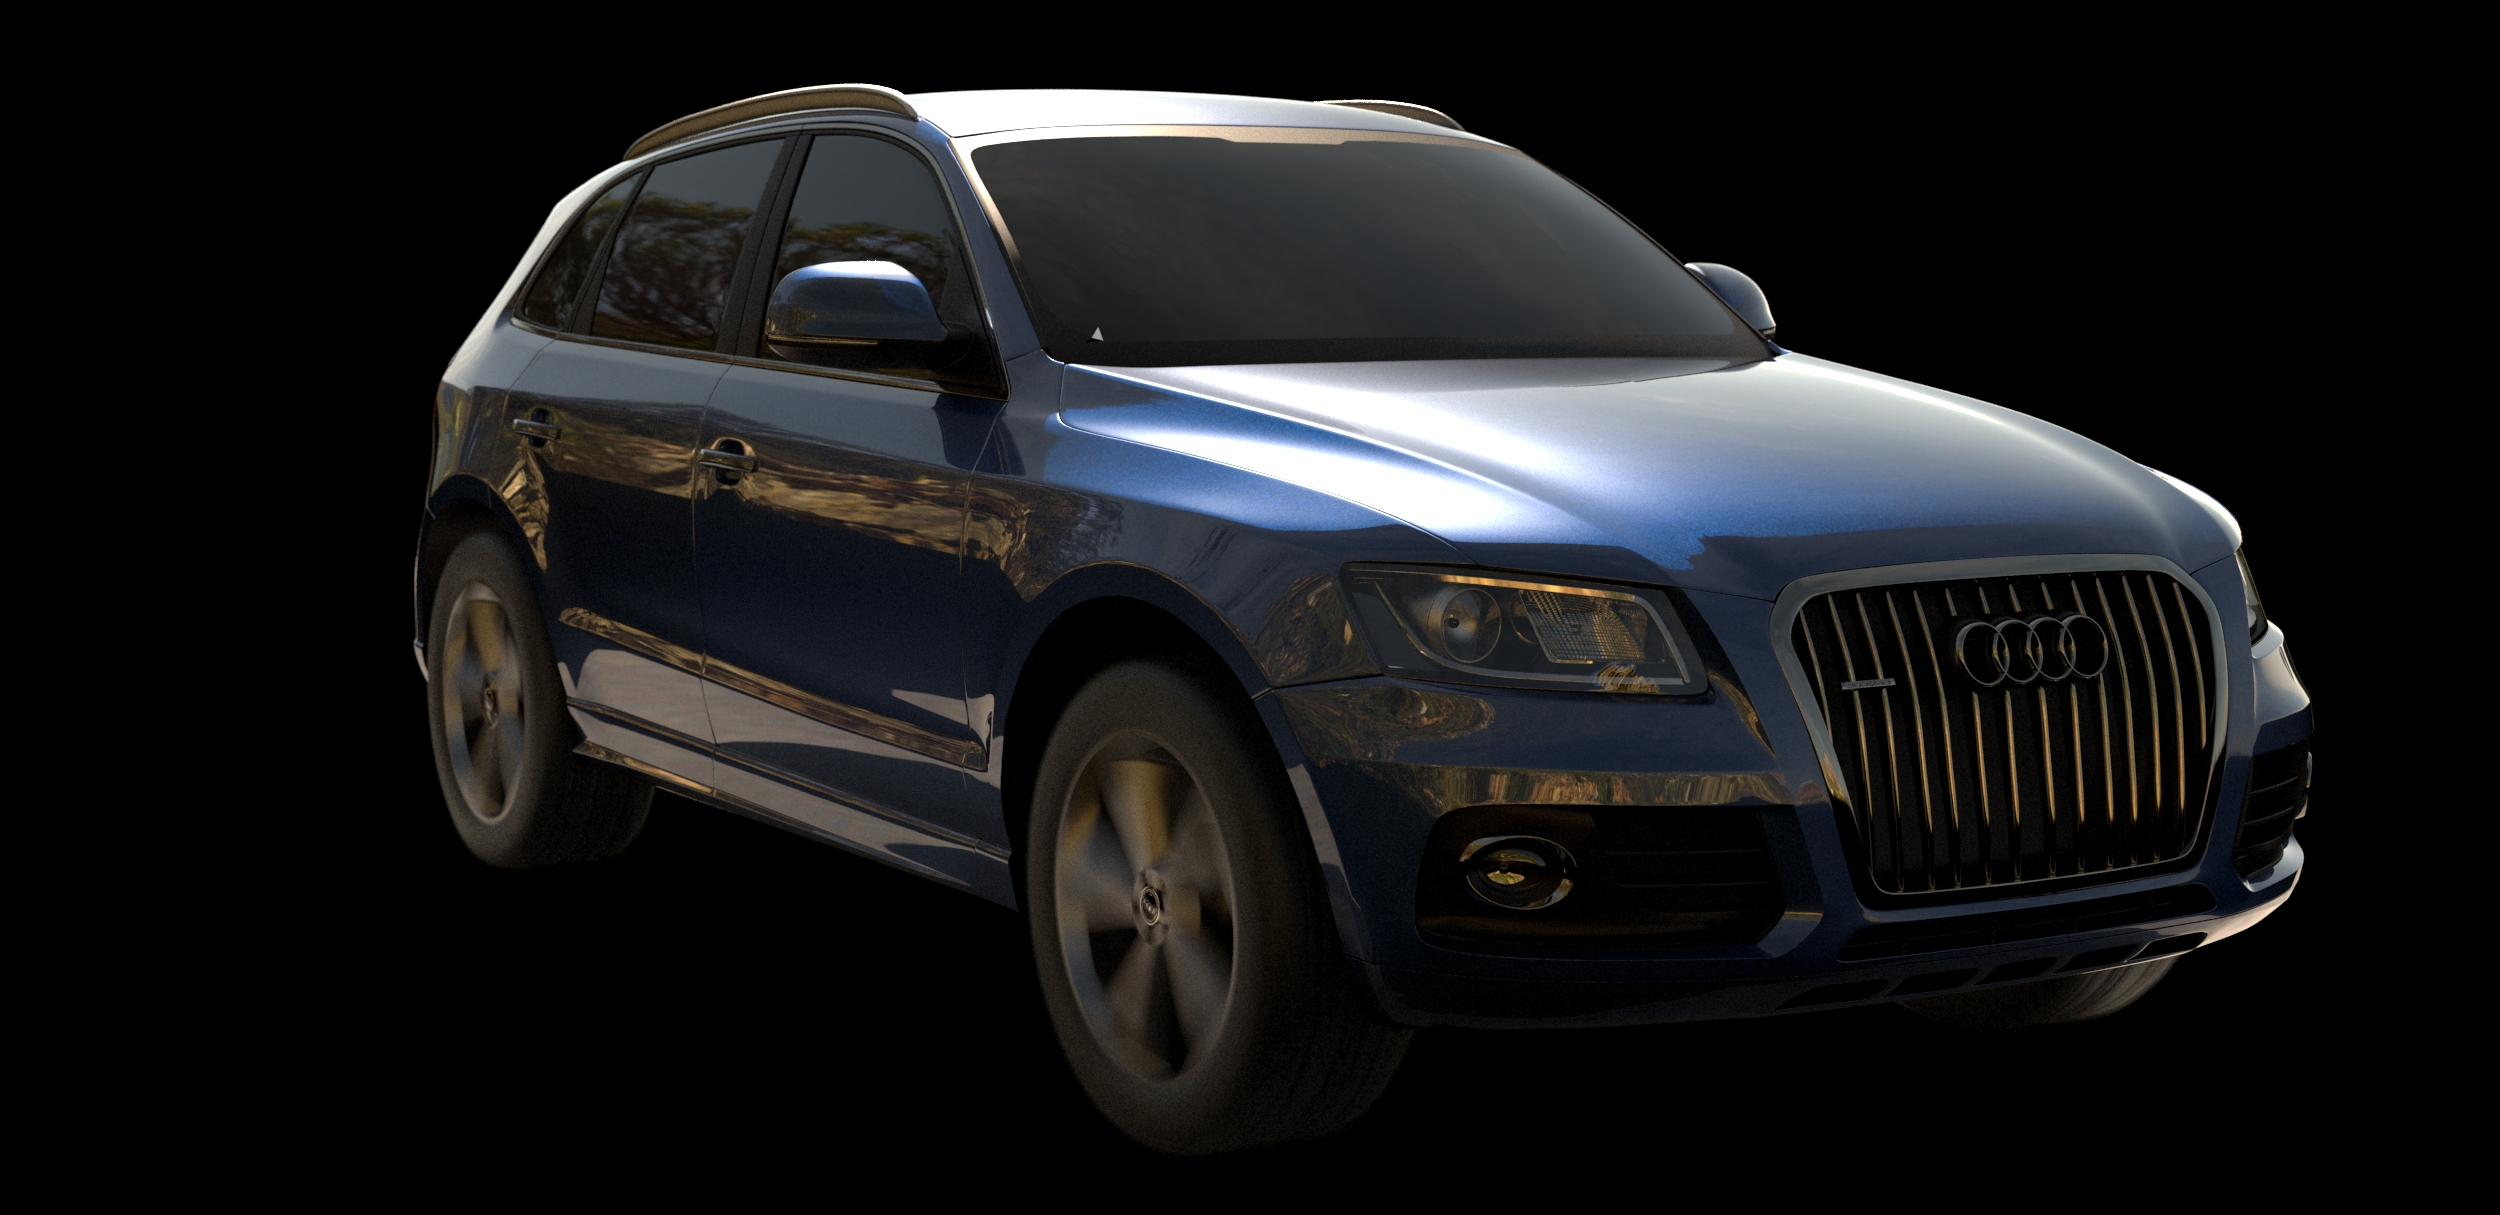 Audi_Q5_000.jpg